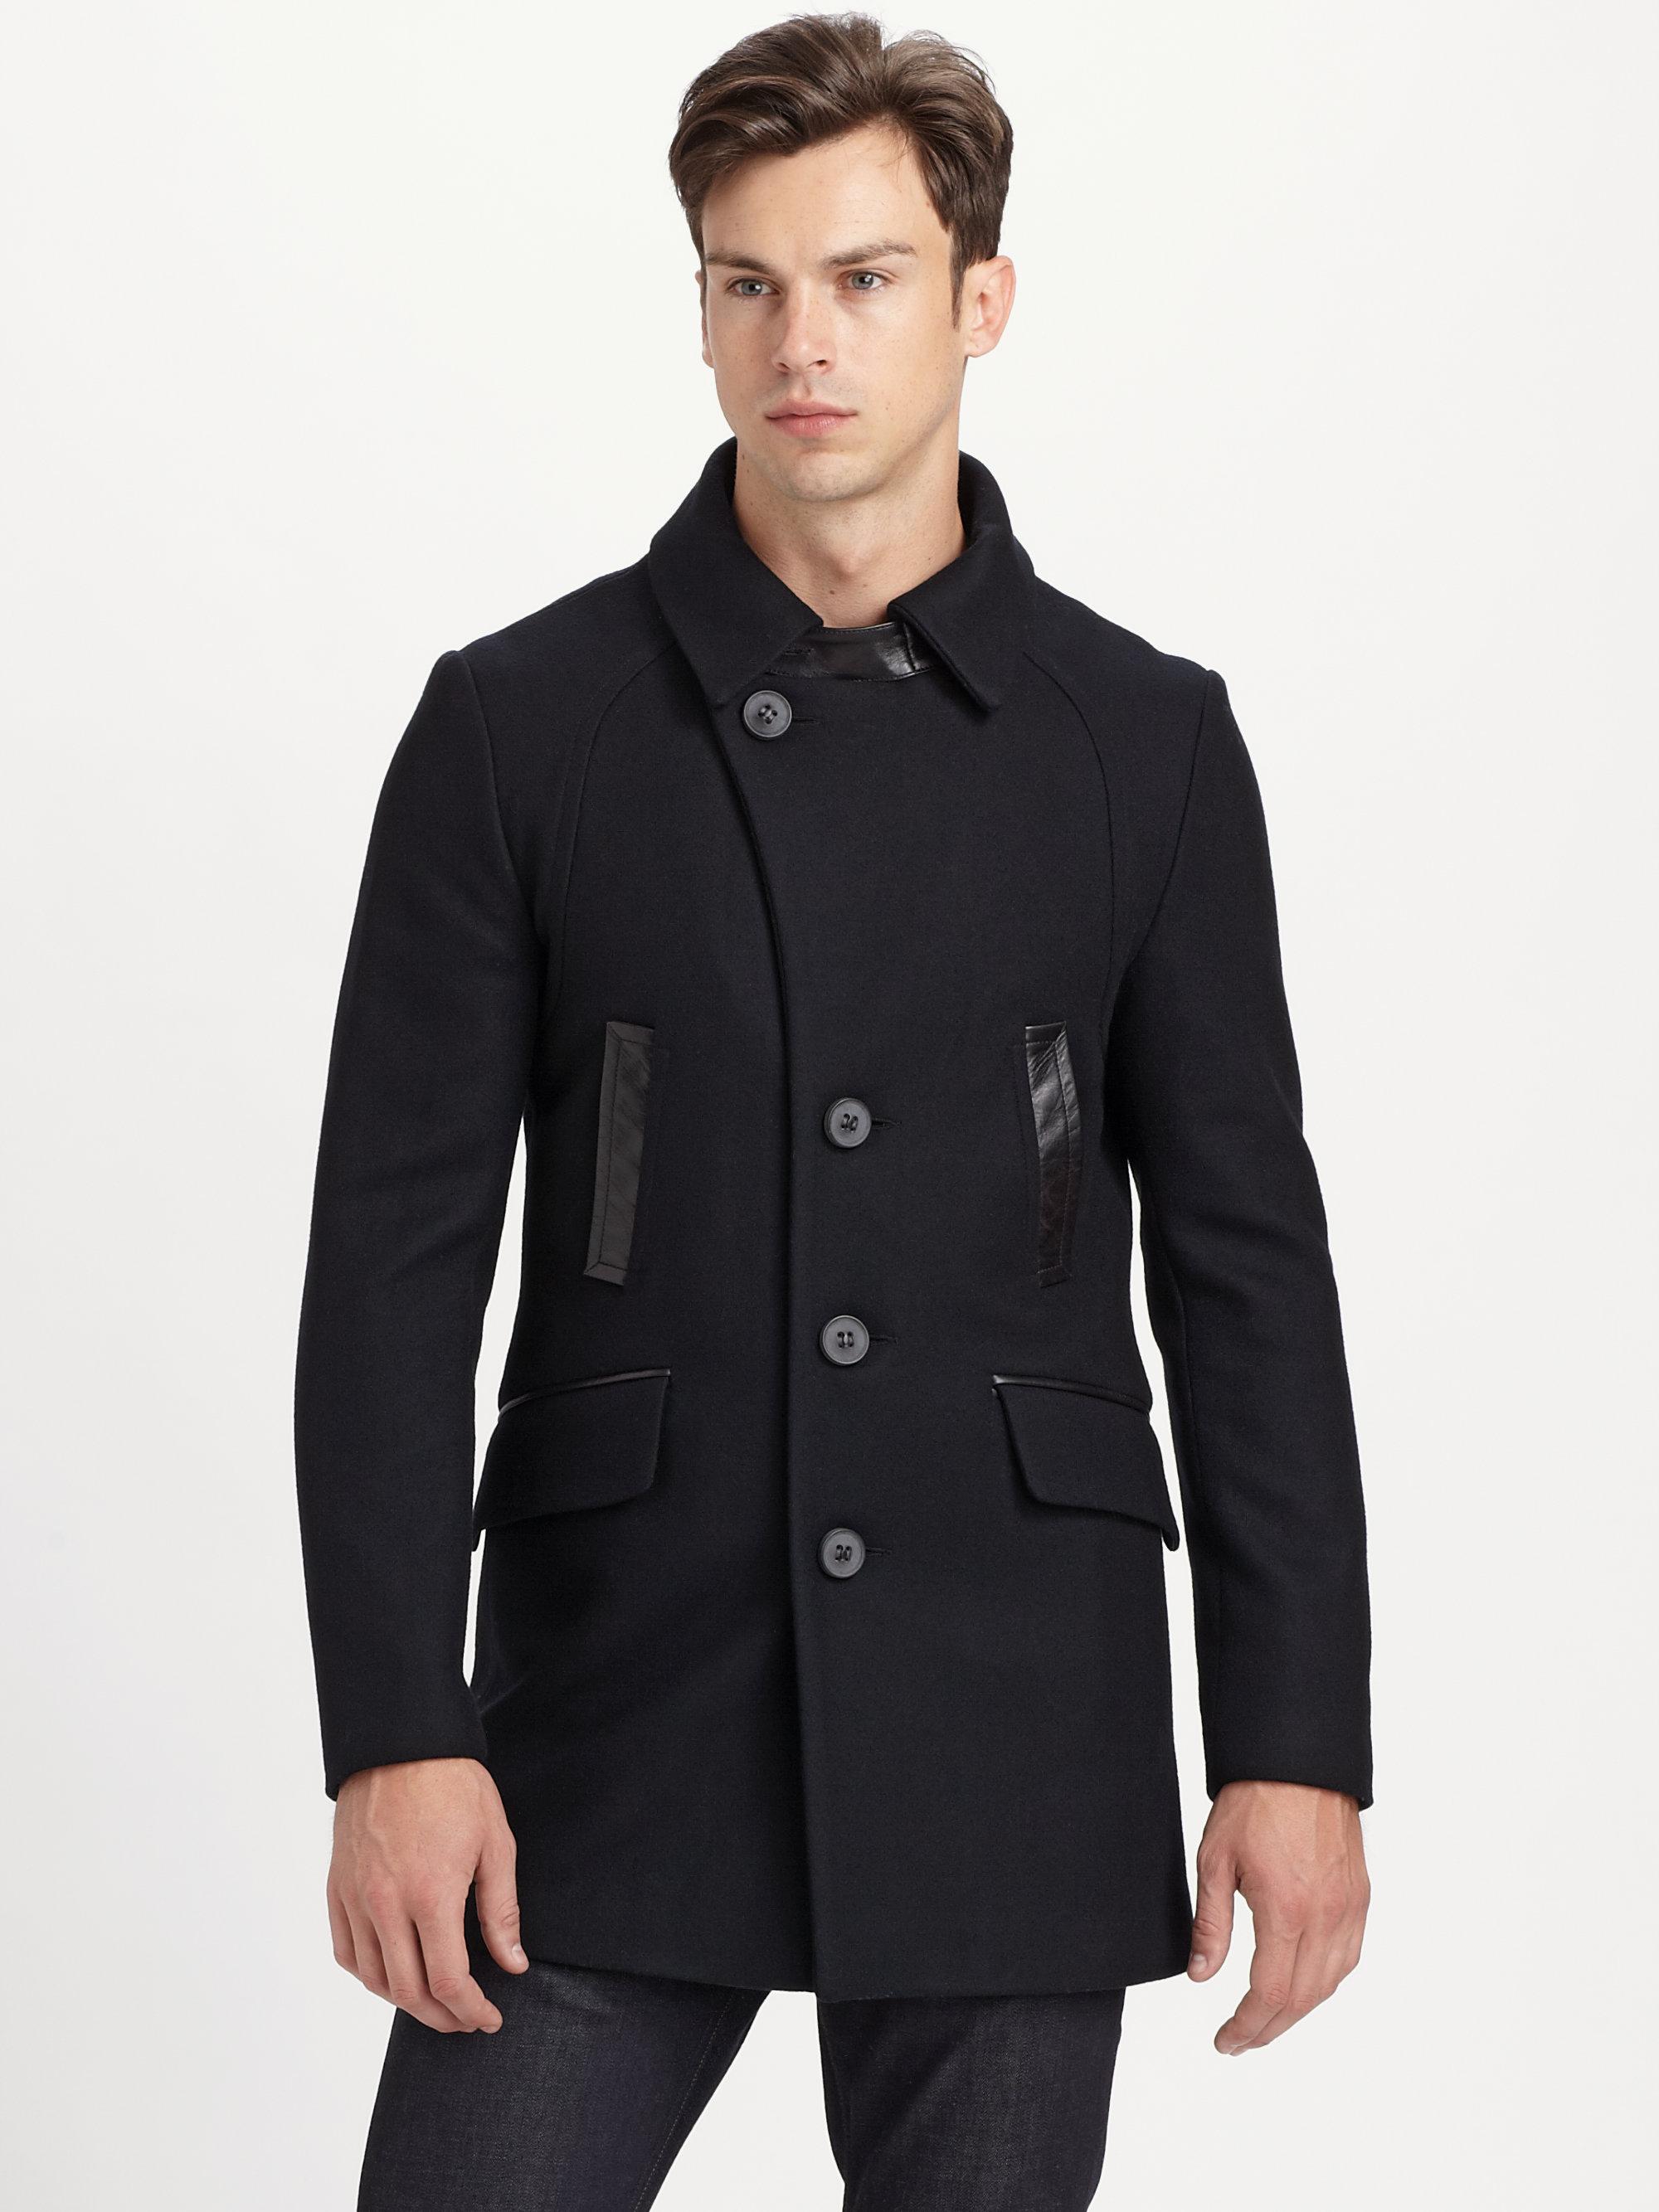 Mackage Clark Peacoat in Black for Men | Lyst